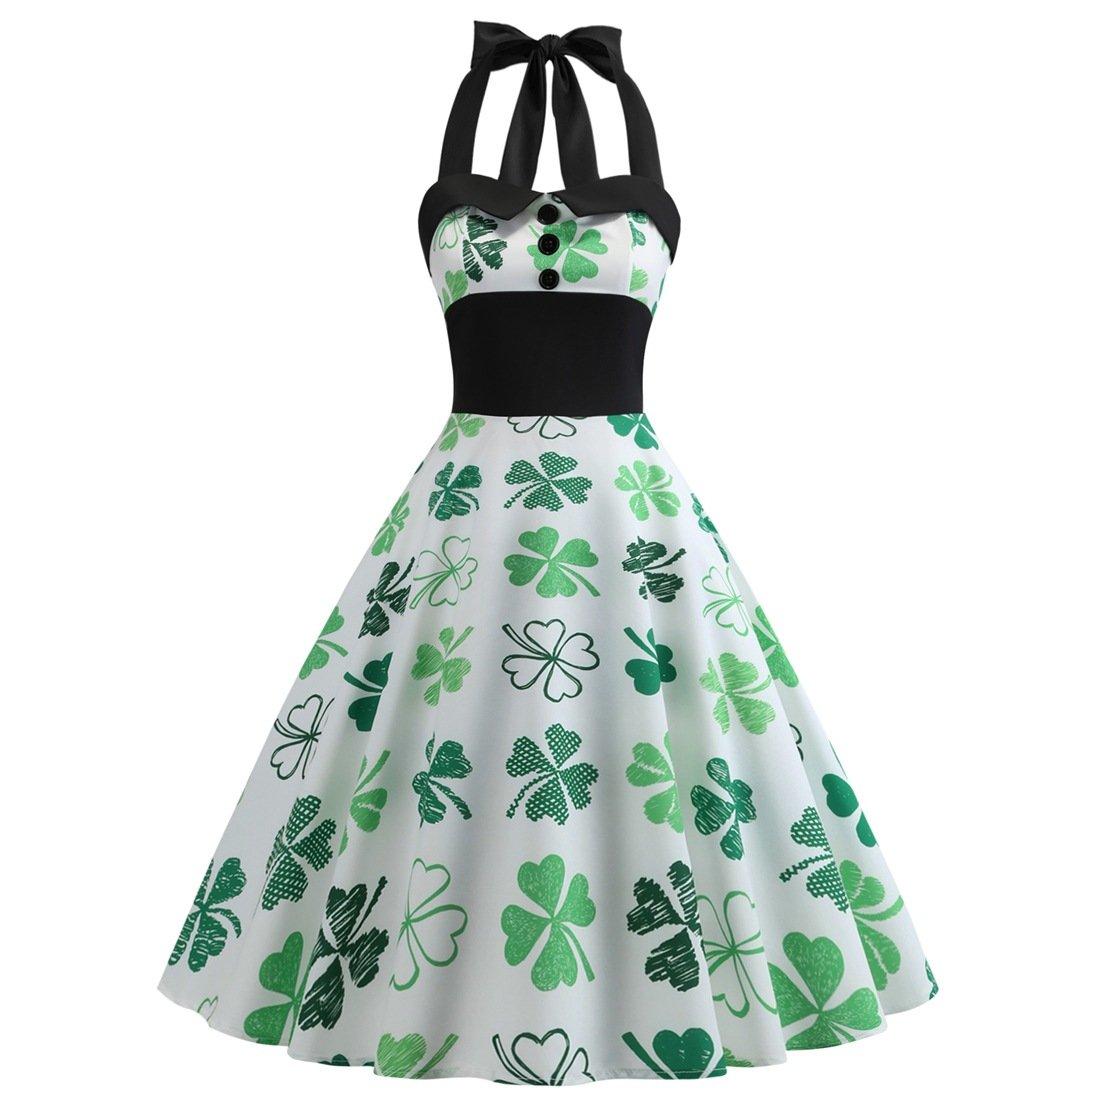 Plus Size Fashion Clothing St. Patrick Vintage Casual Dresses Shamrocks Printed Retro Party Dress